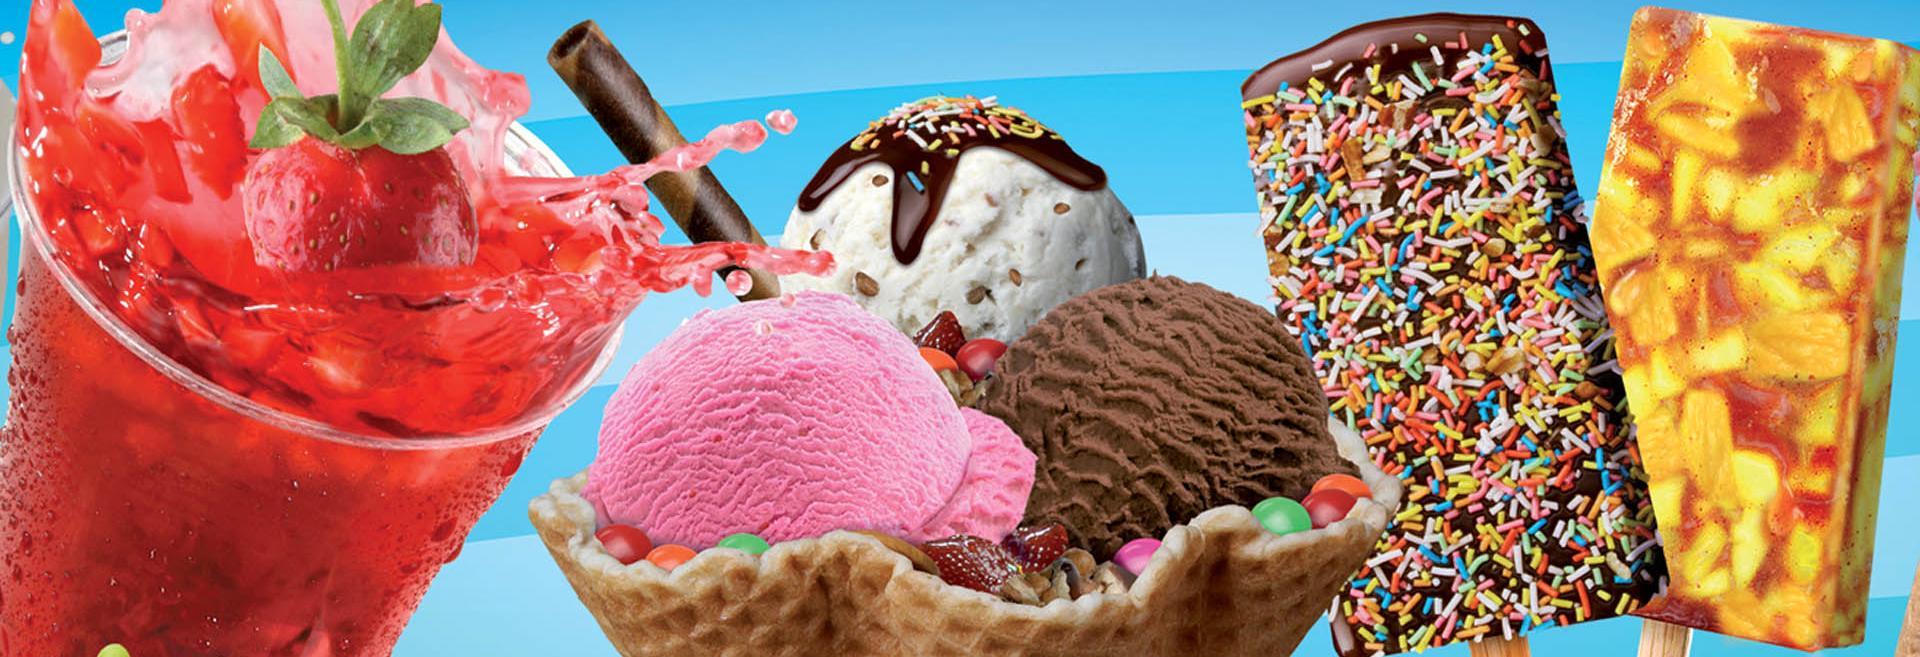 La Michoacana Premier logo Lake Forest ca ice cream coupons near me